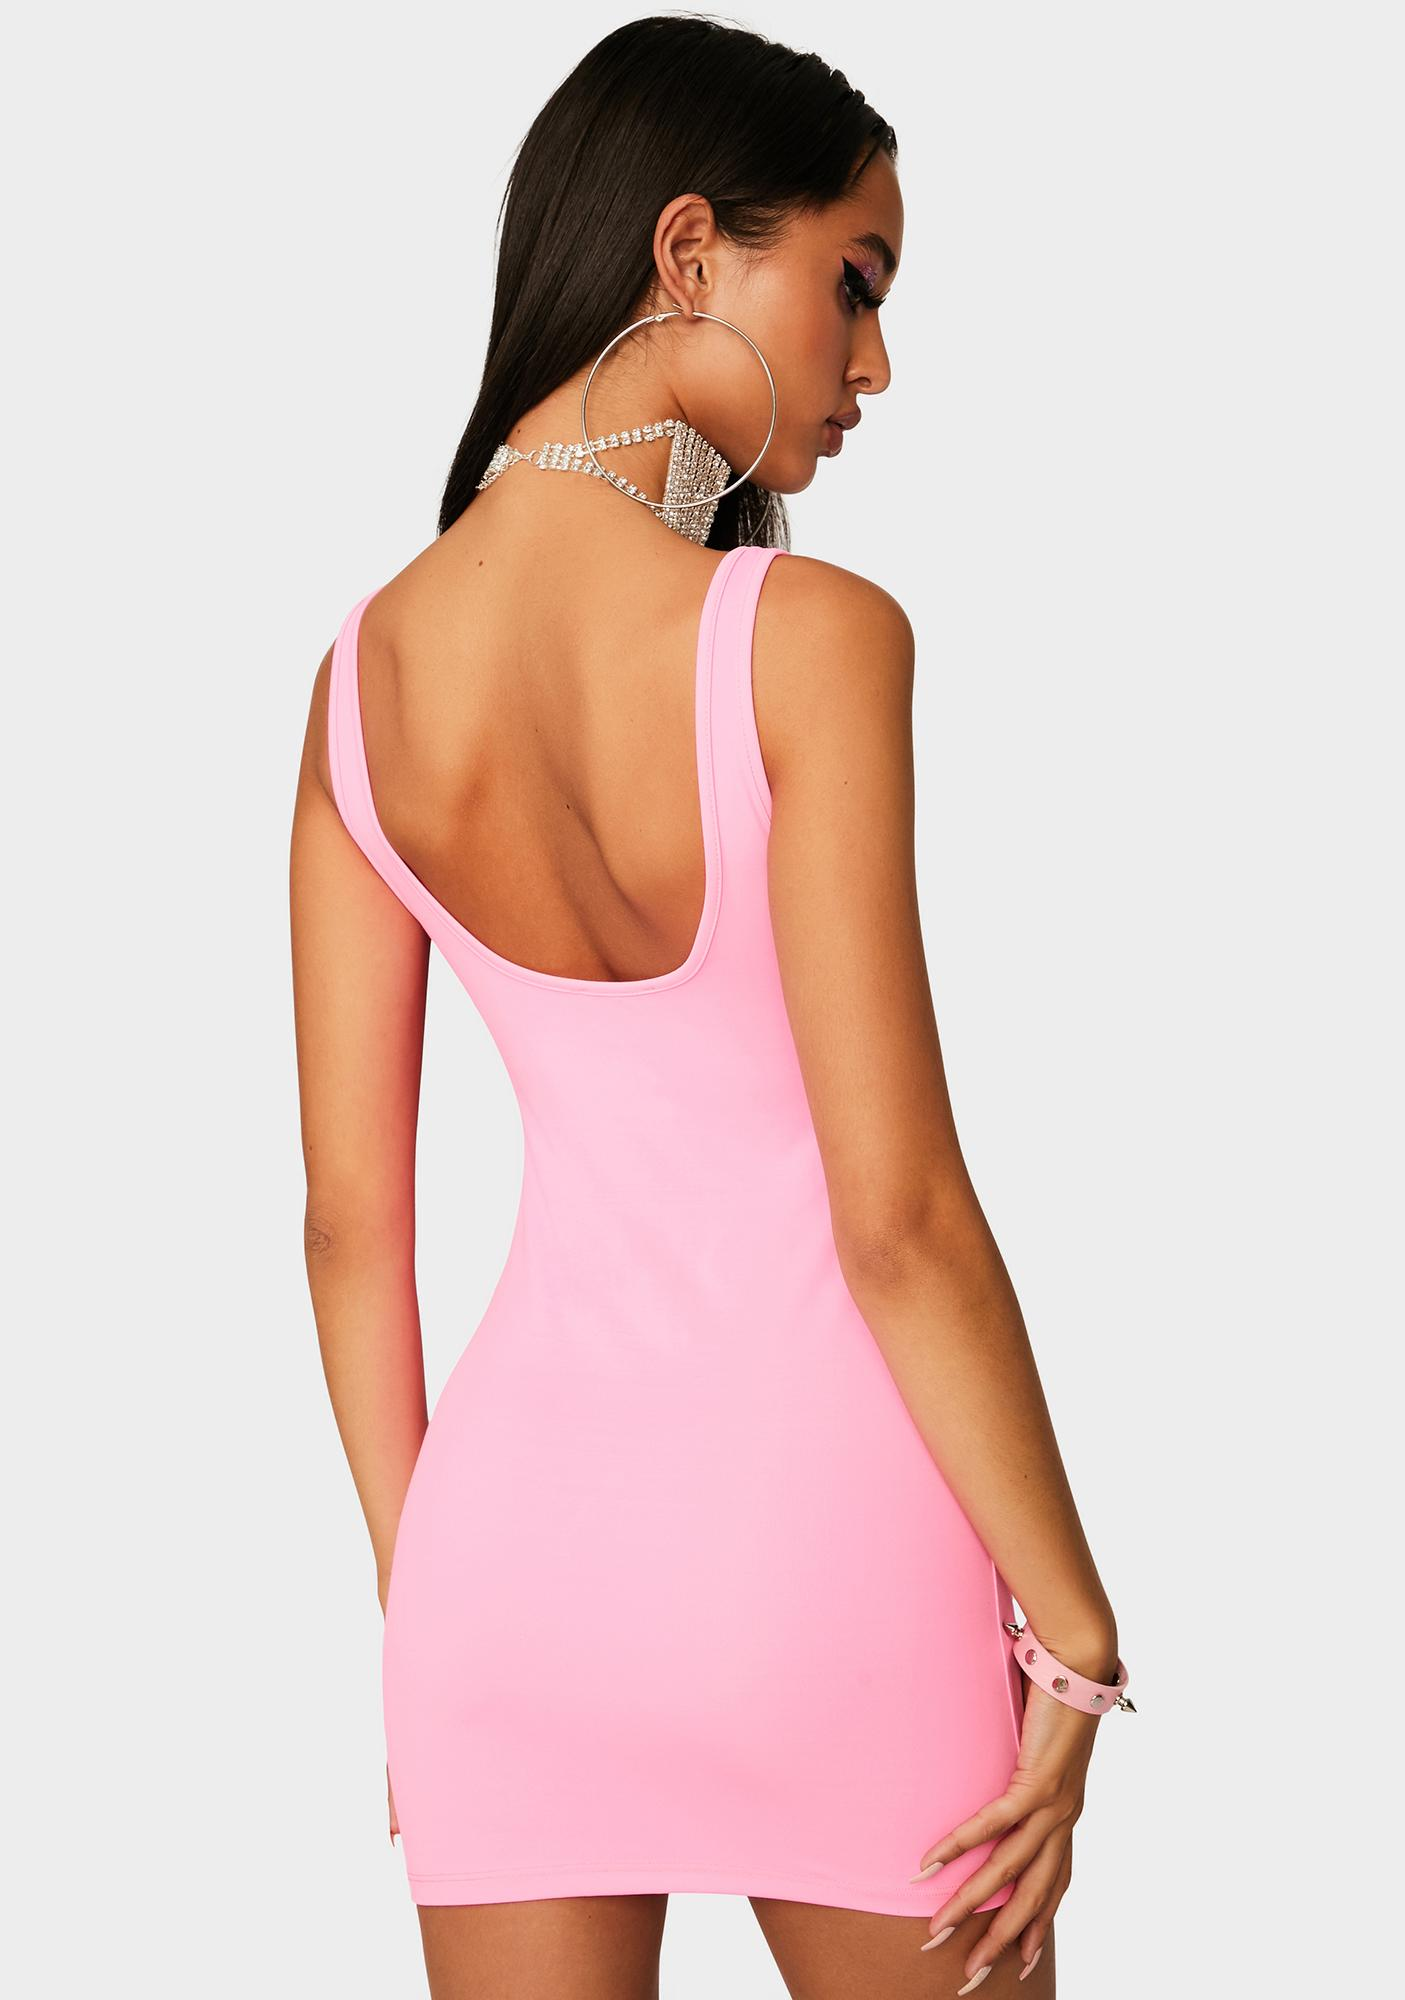 Kiki Riki Cupcake Babealicious Mini Dress